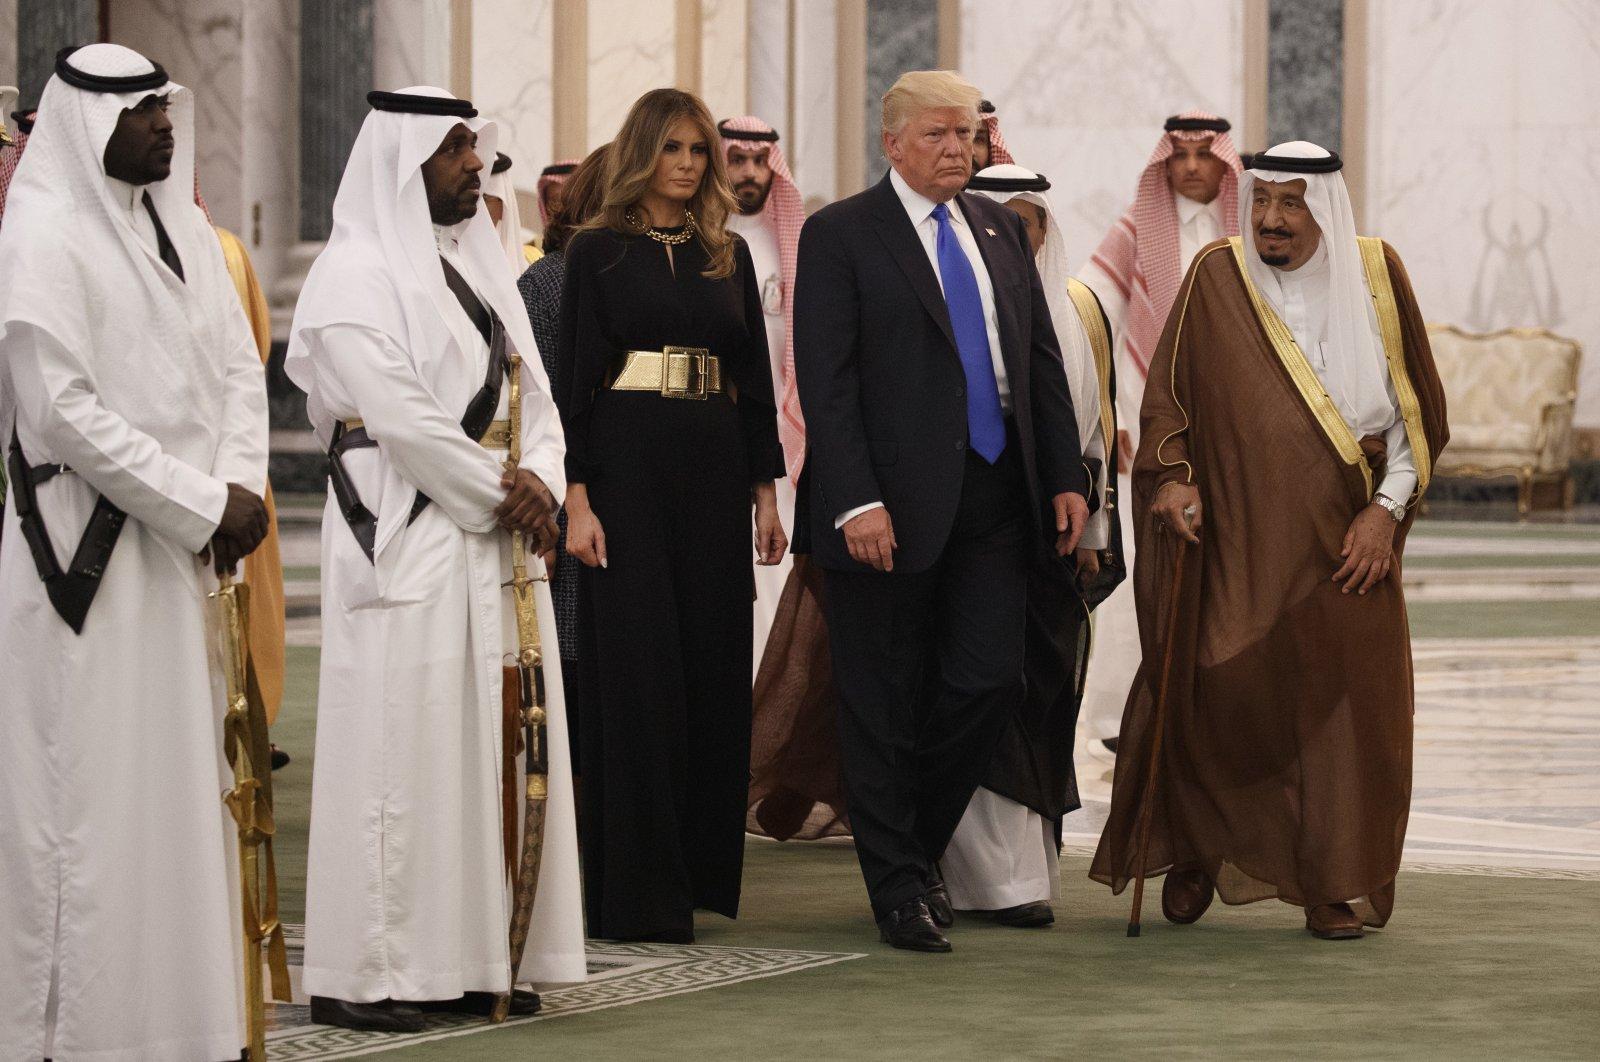 Former U.S. President Donald Trump and first lady Melania Trump walk with Saudi King Salman to a coffee ceremony and presentation ceremony of the Collar of Abdulaziz Al Saud Medal at the Royal Court Palace in Riyadh, Saudi Arabia, May 20, 2017. (AP Photo)